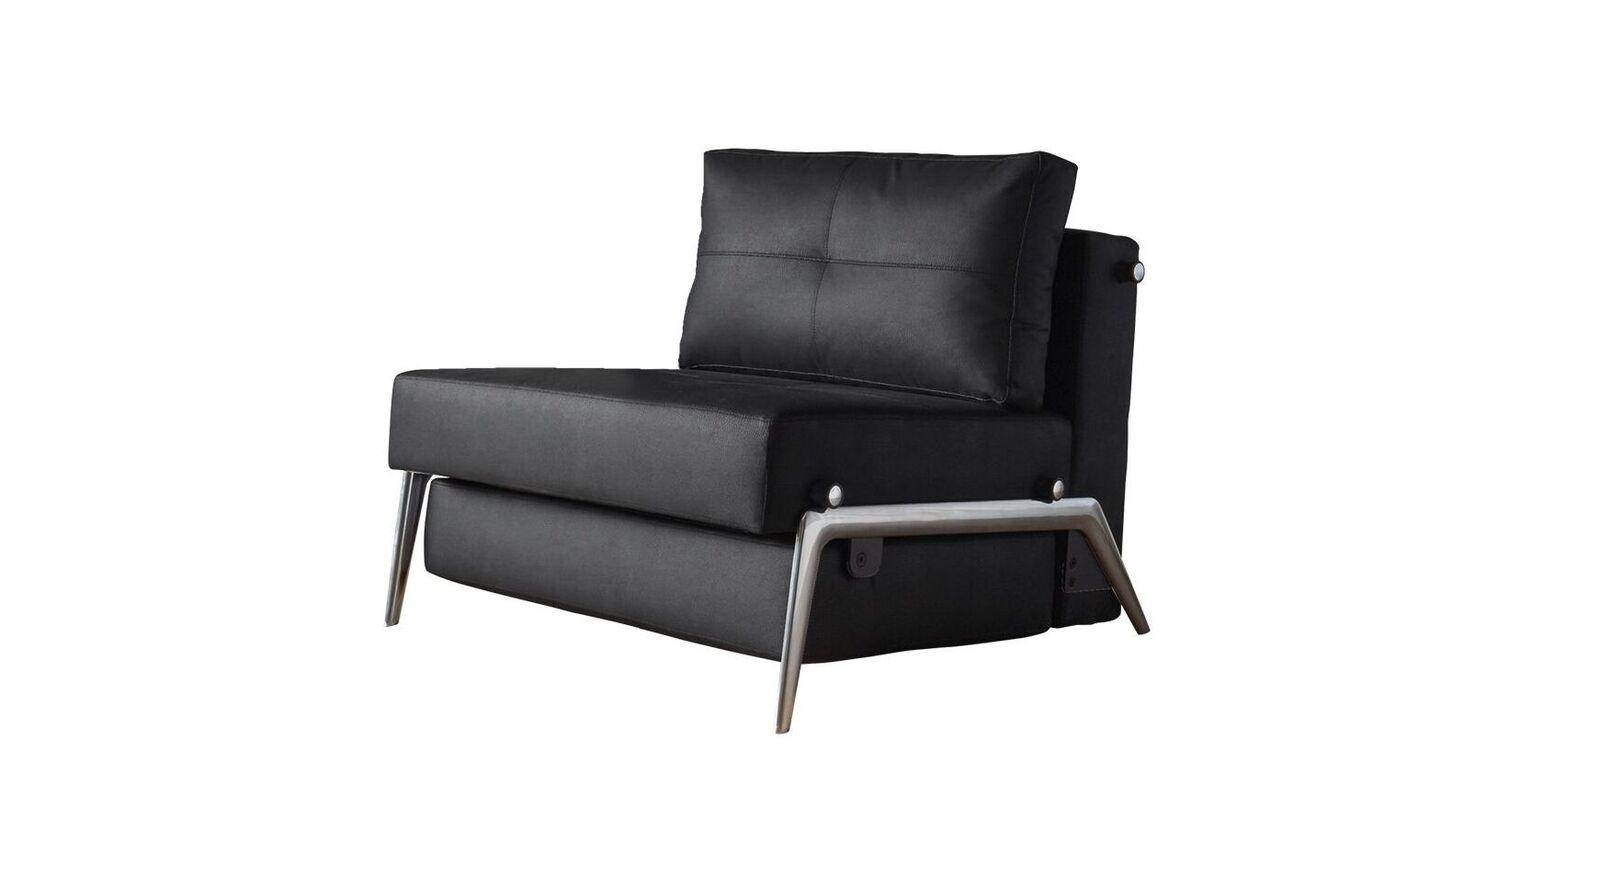 Schlafsofa Ramasa als schmaler Sessel